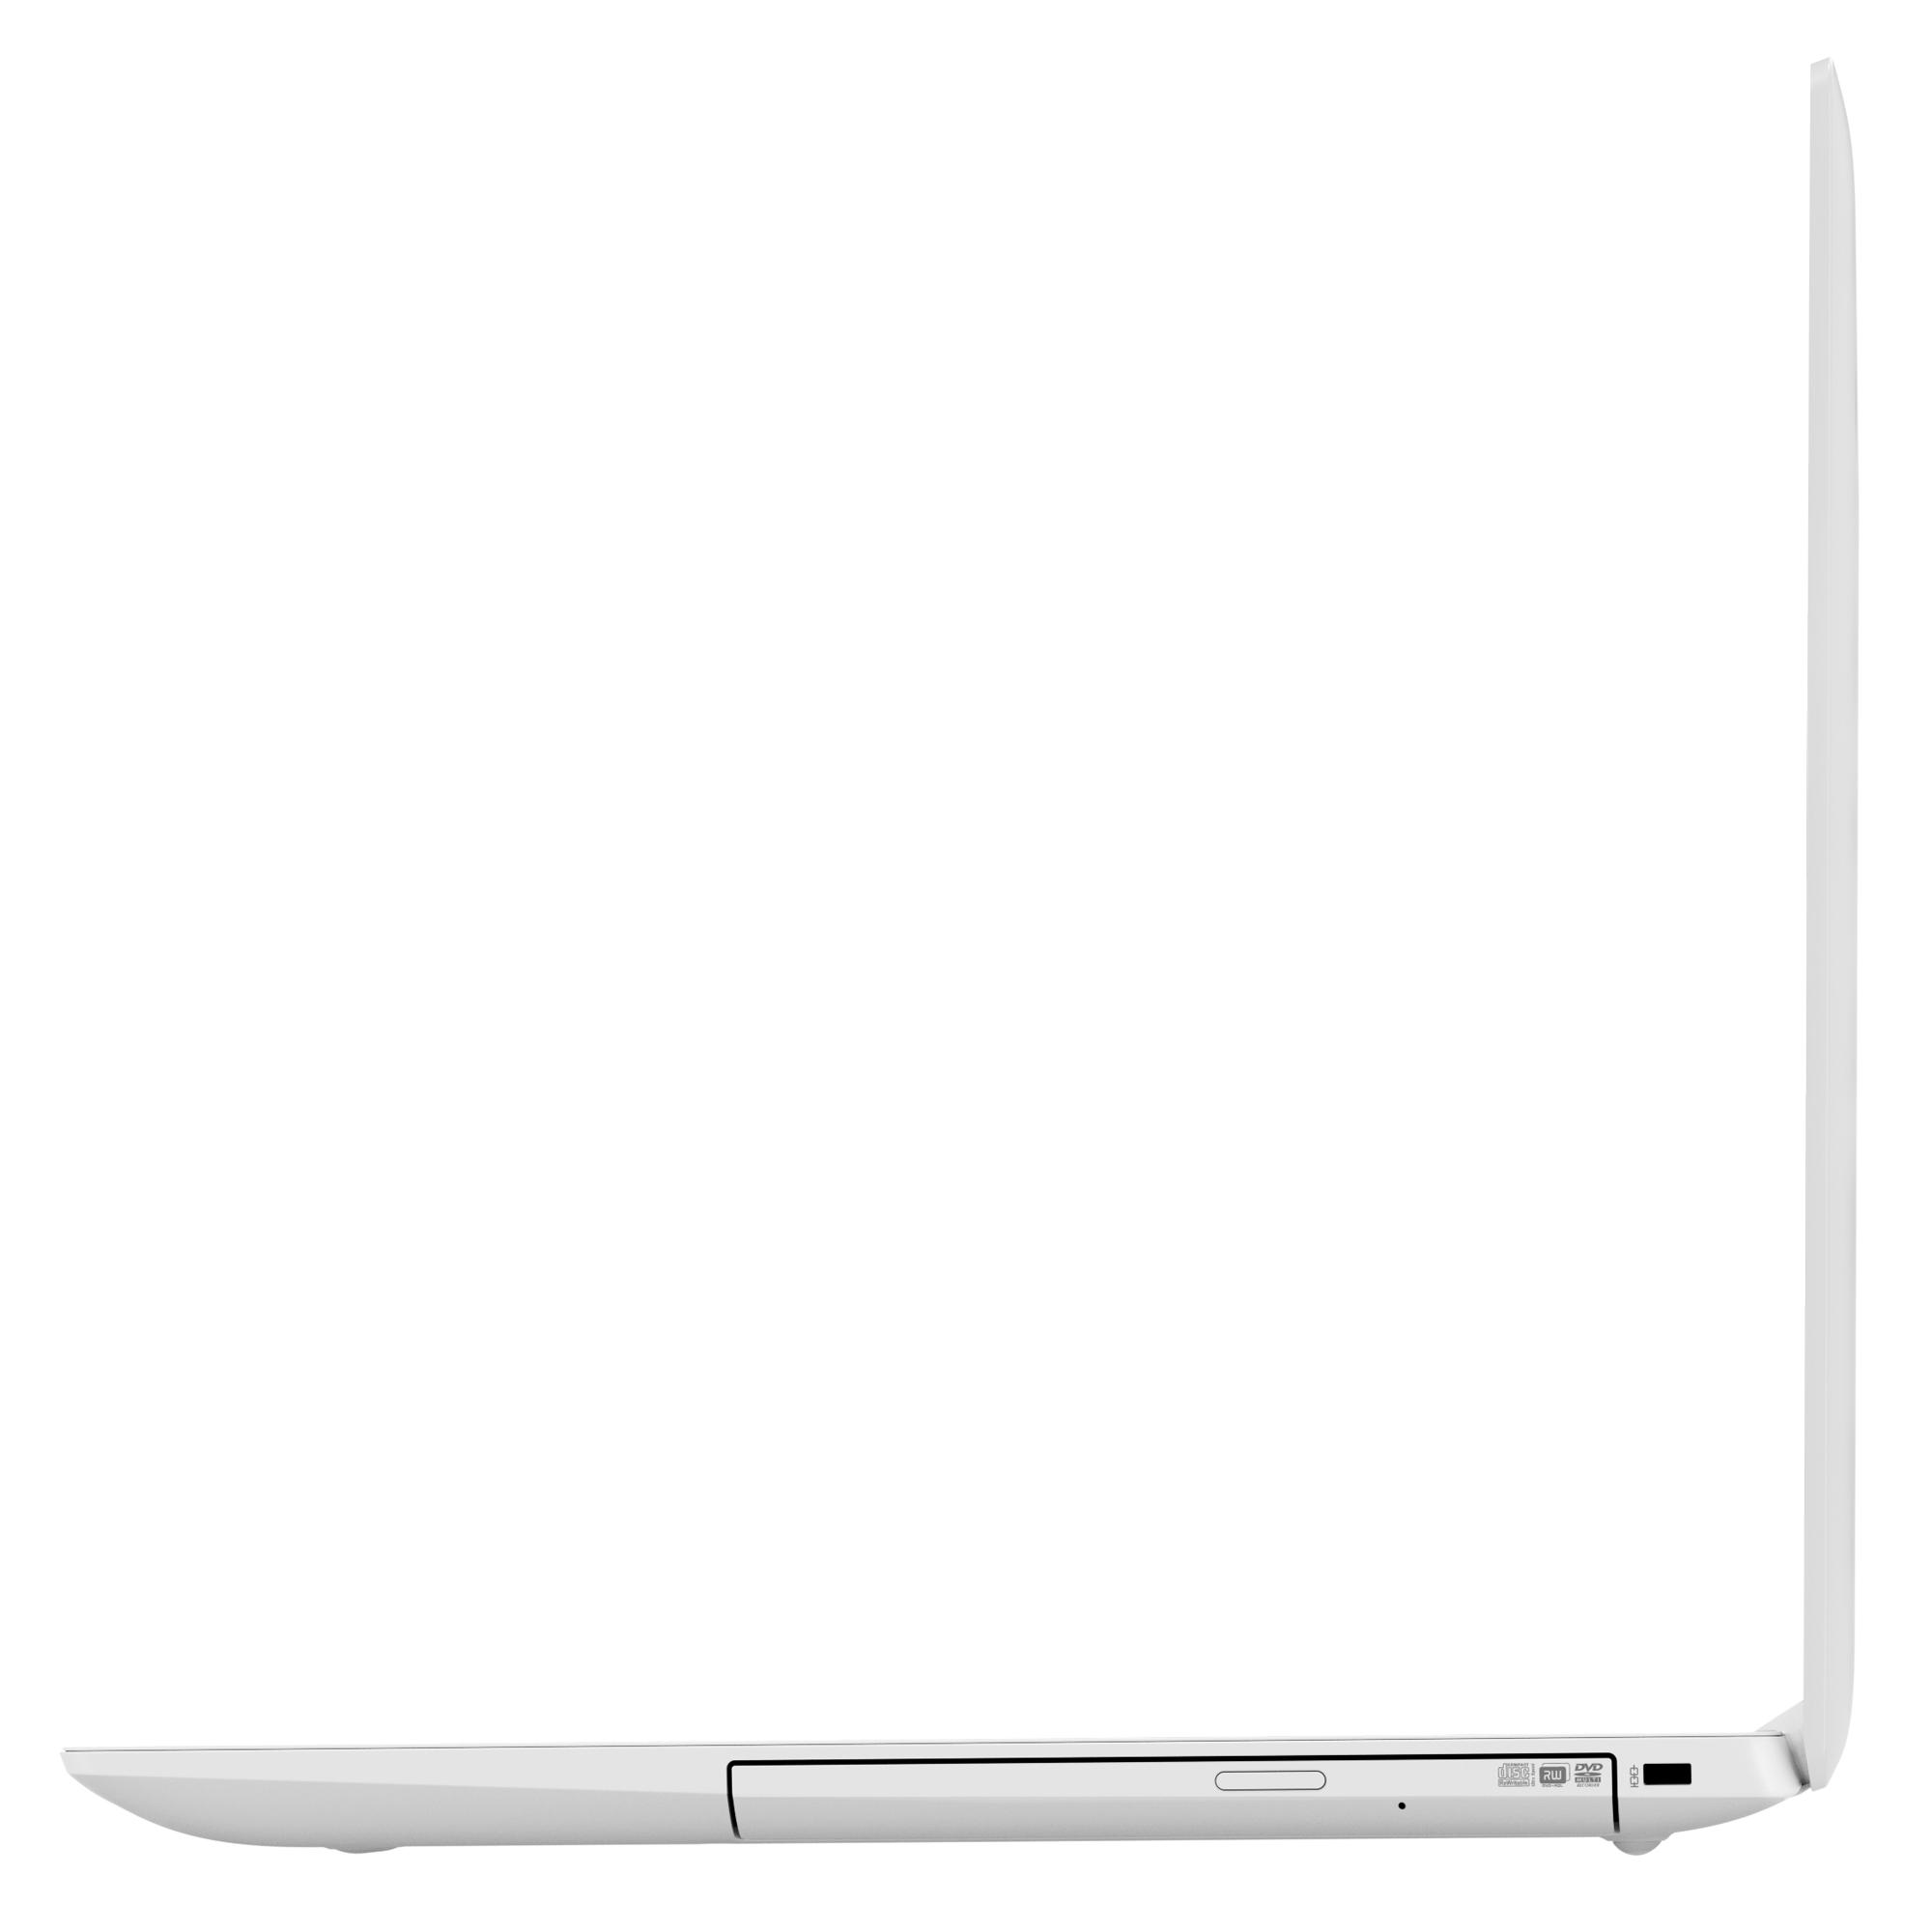 Фото  Ноутбук Lenovo ideapad 330-15 Blizzard White (81DE02F1RA)